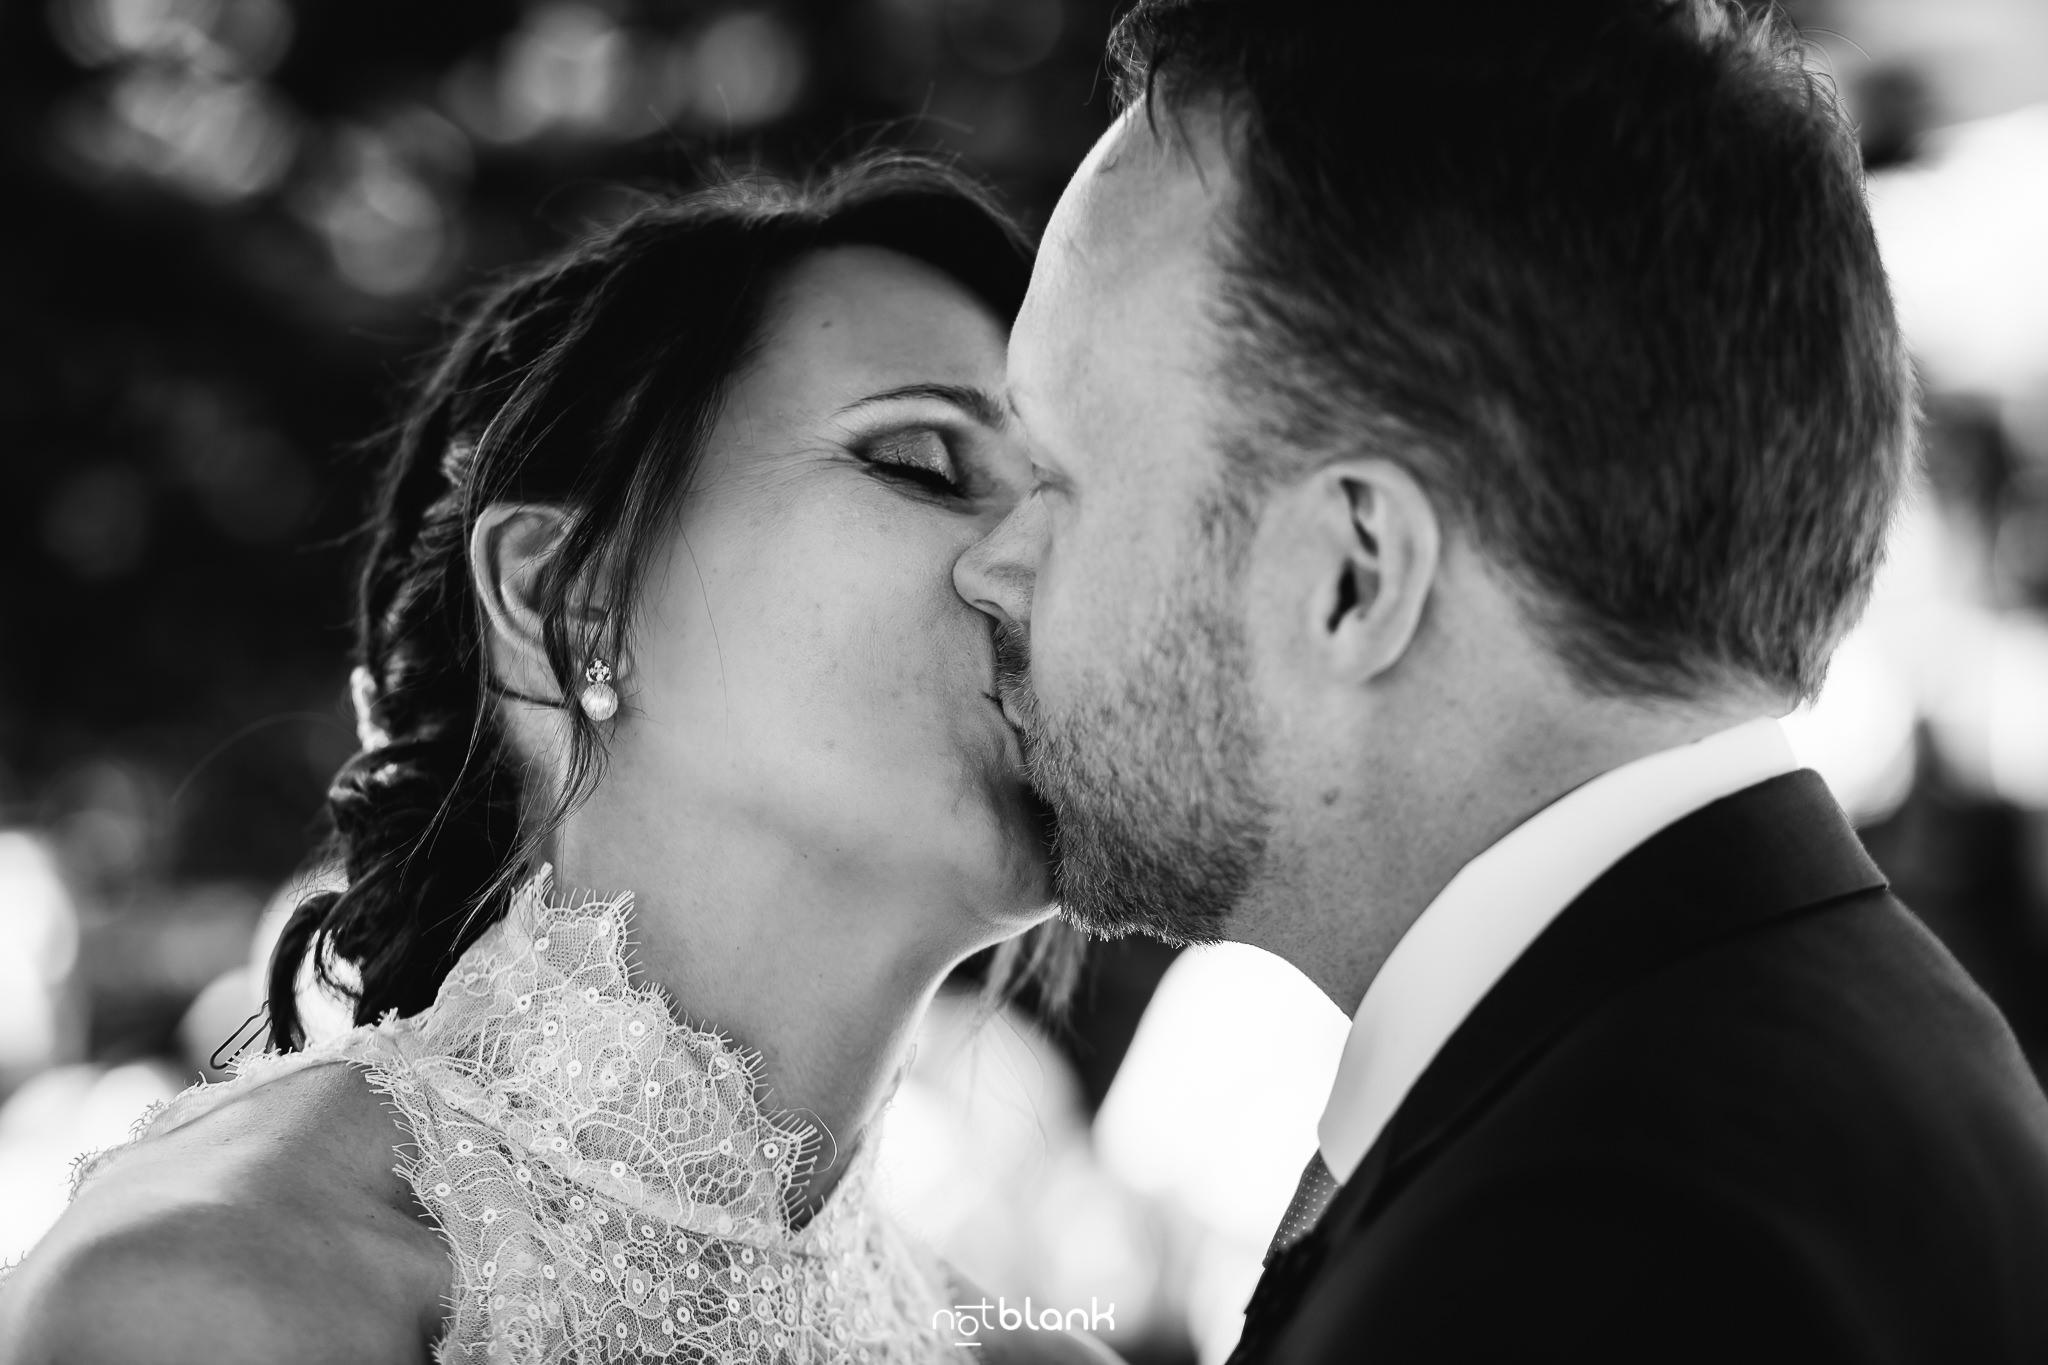 Boda-Maite-David-Novios-Besandose-En-Altar-Ceremonia-Civil-Talaso-Atlantico. Reportaje realizado por Notblank fotógrafos de boda